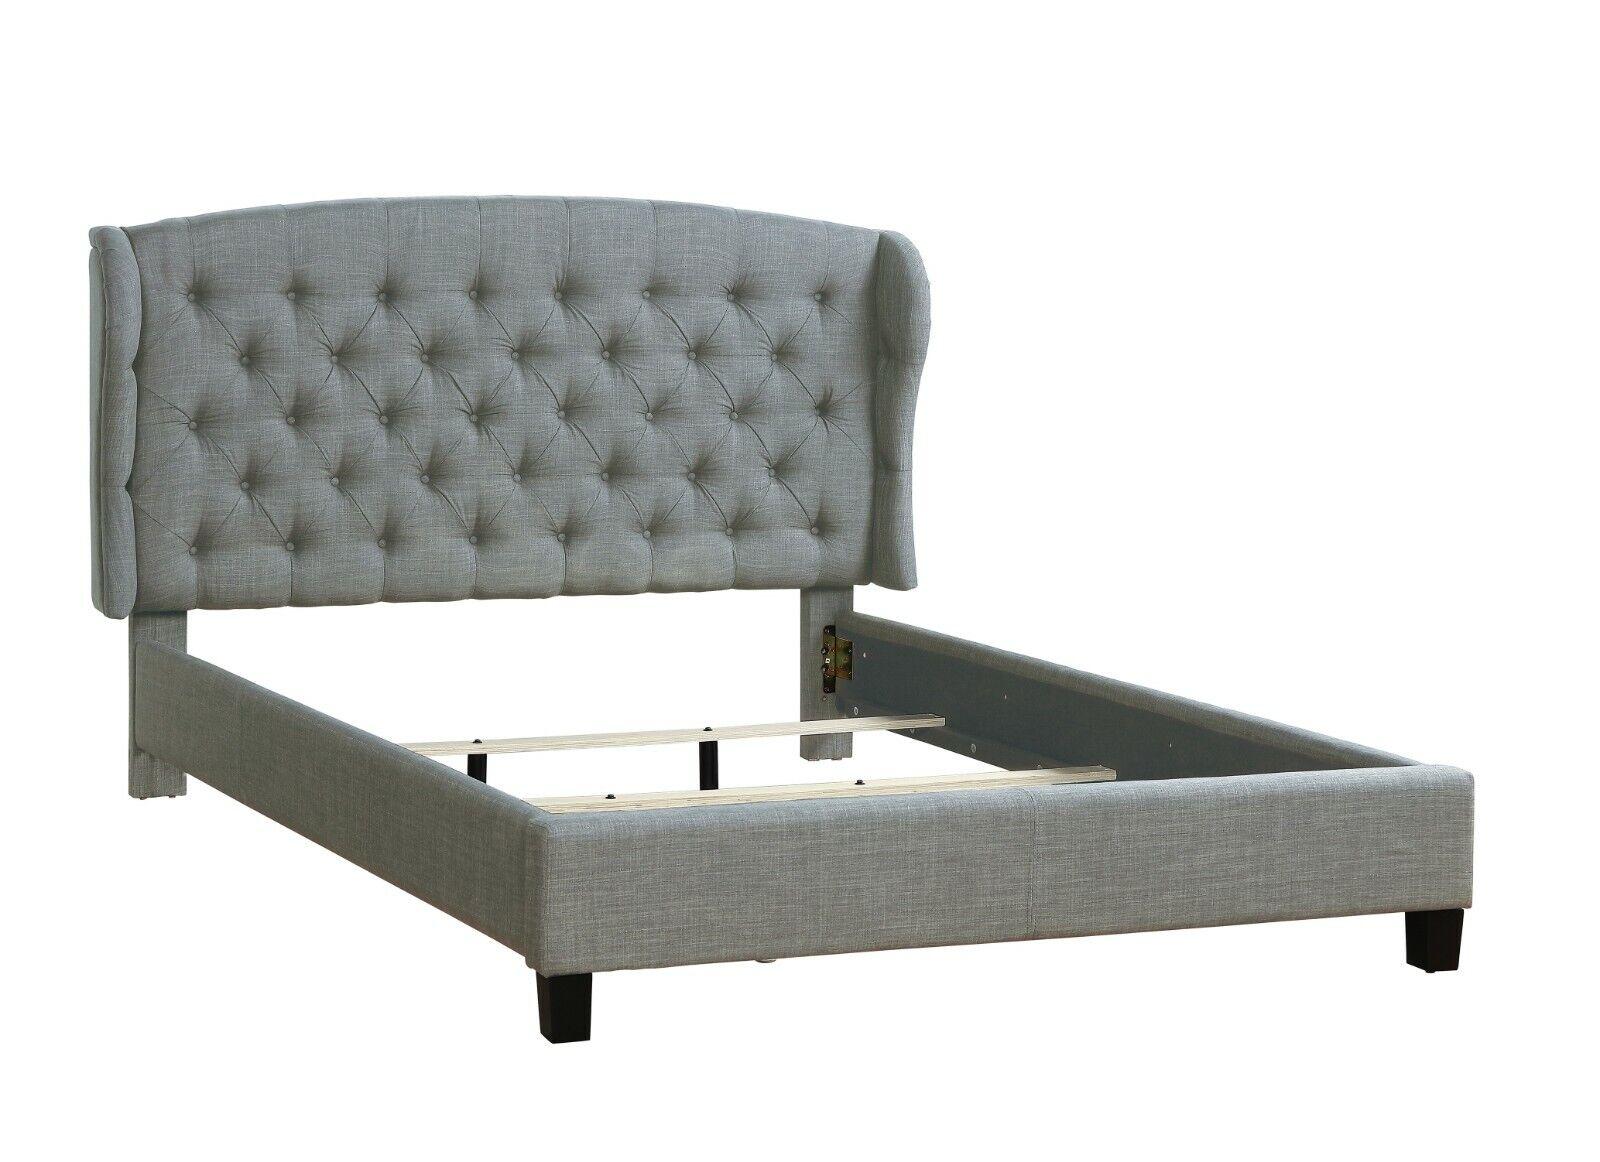 Antique Design Western King Size Bed Bedroom Furniture 1pc Traditional Look For Sale Online Ebay